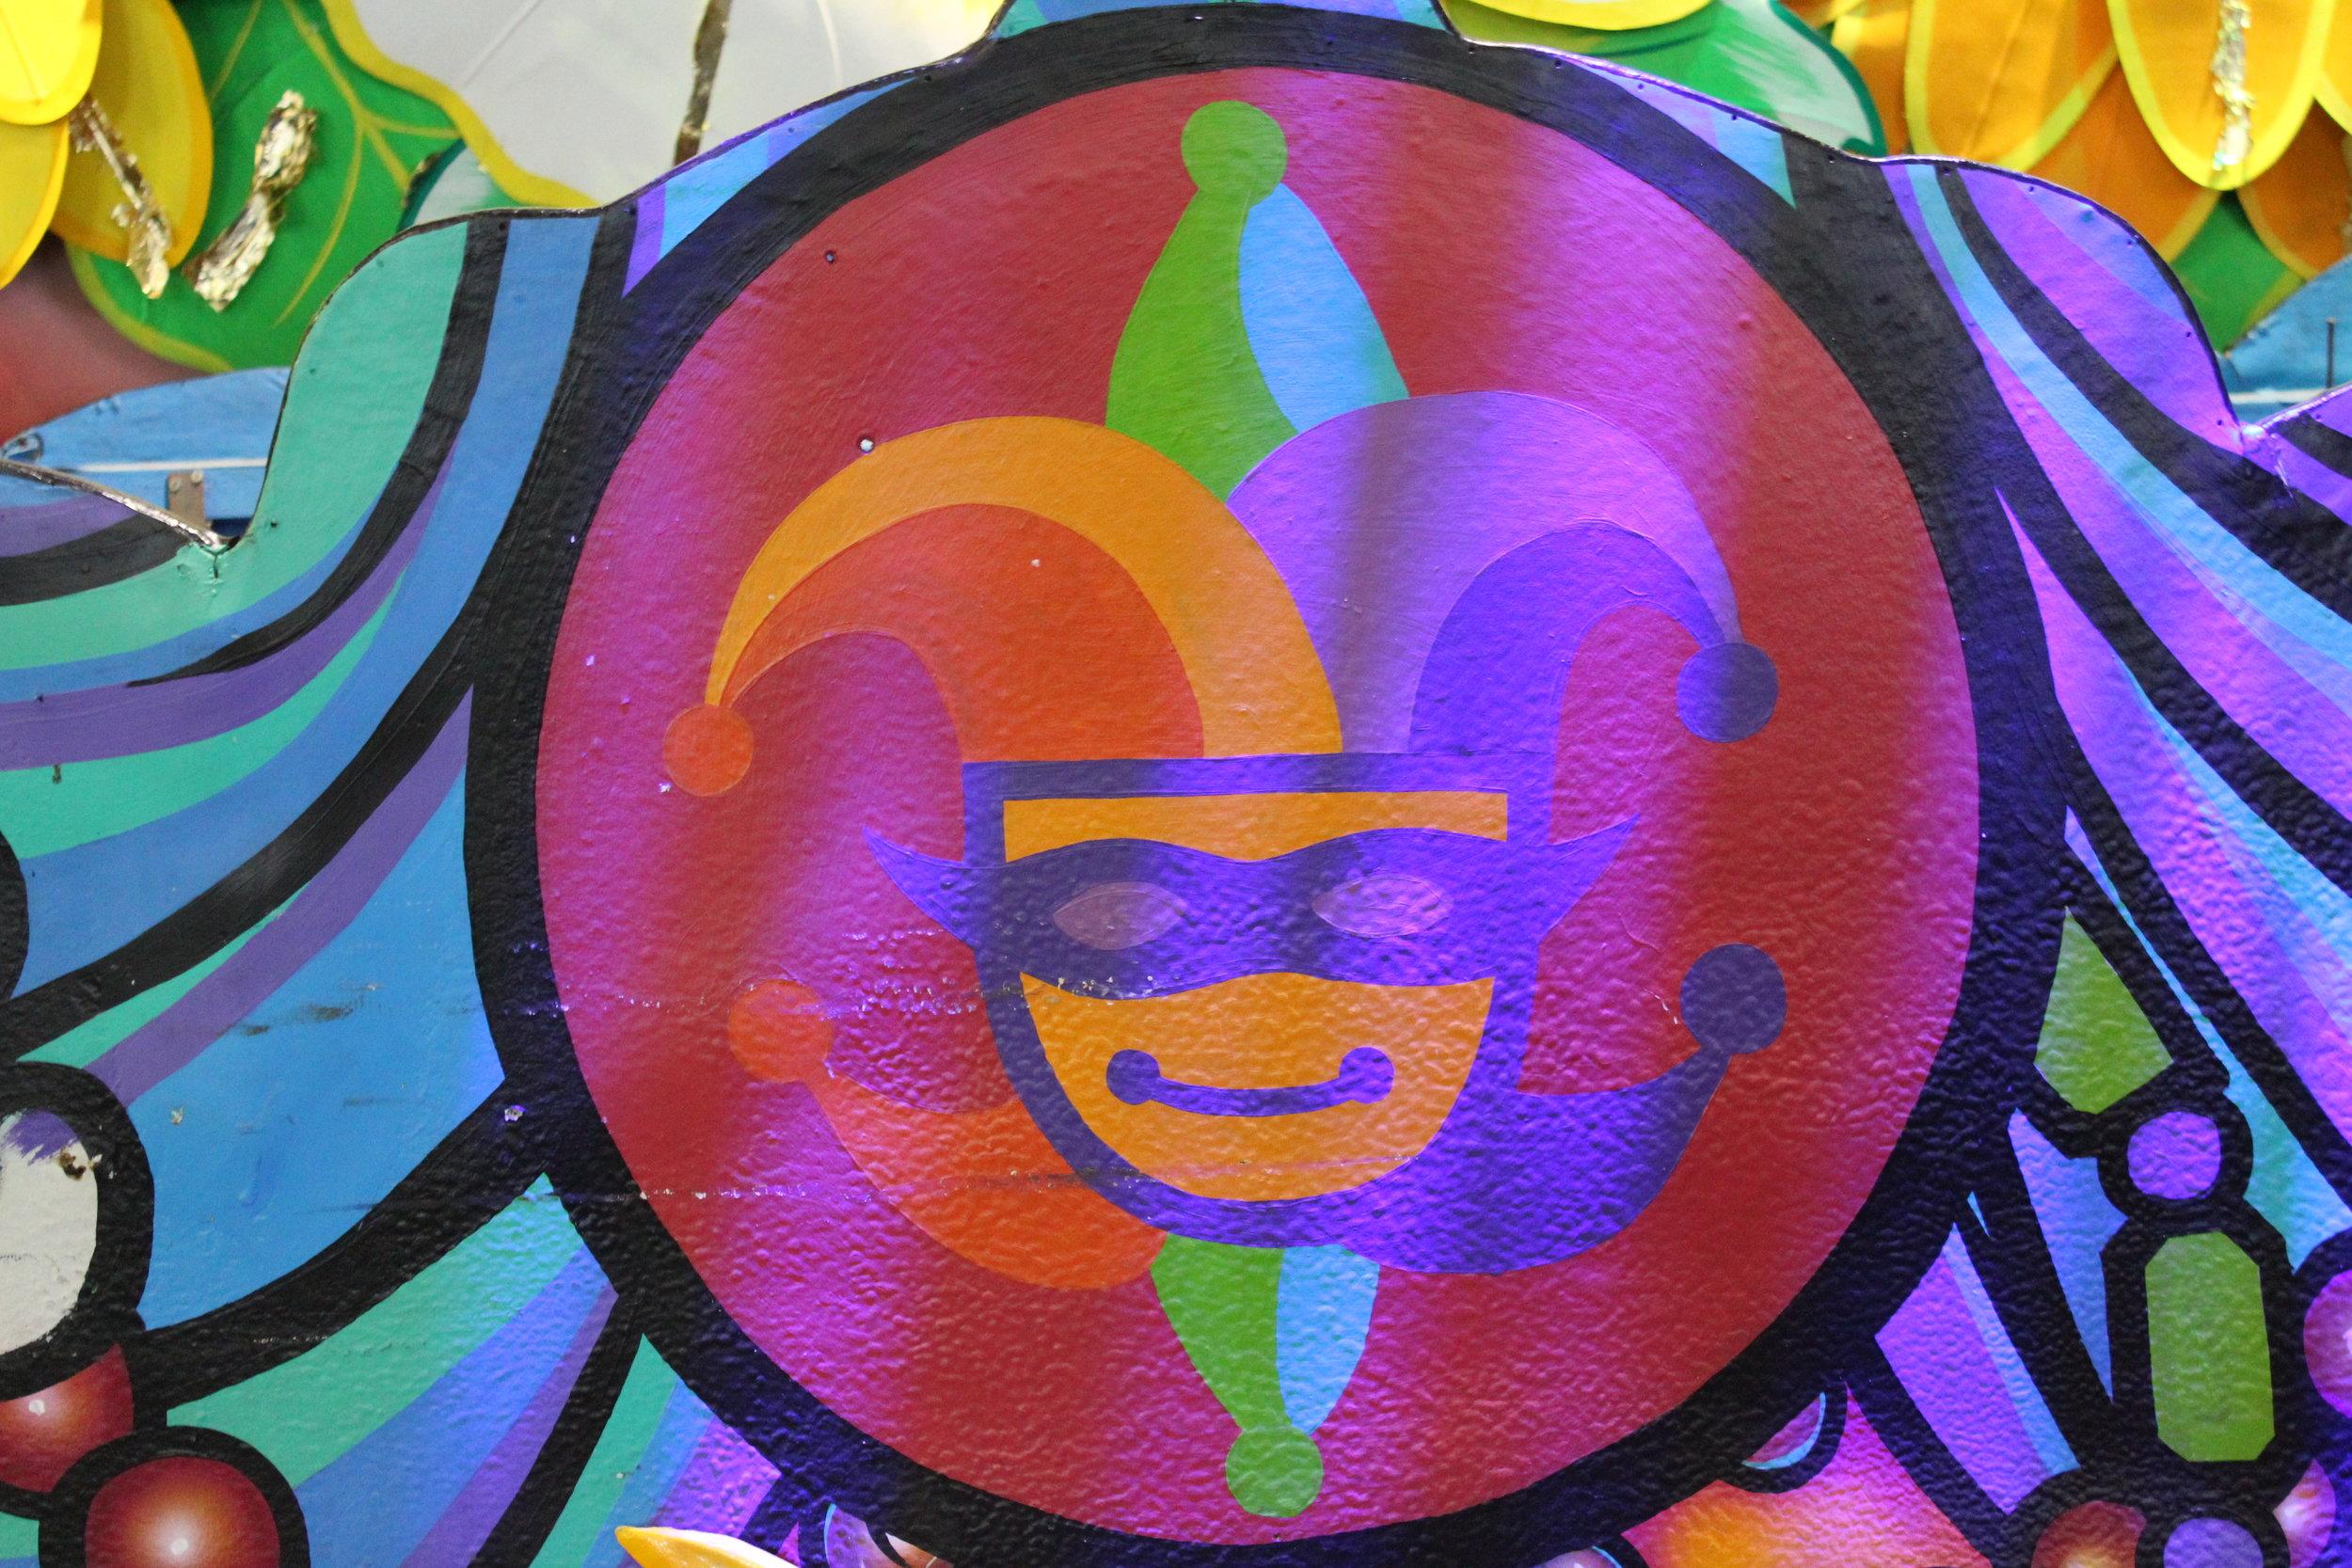 Inside Blaine Kerns Mardi Gras World